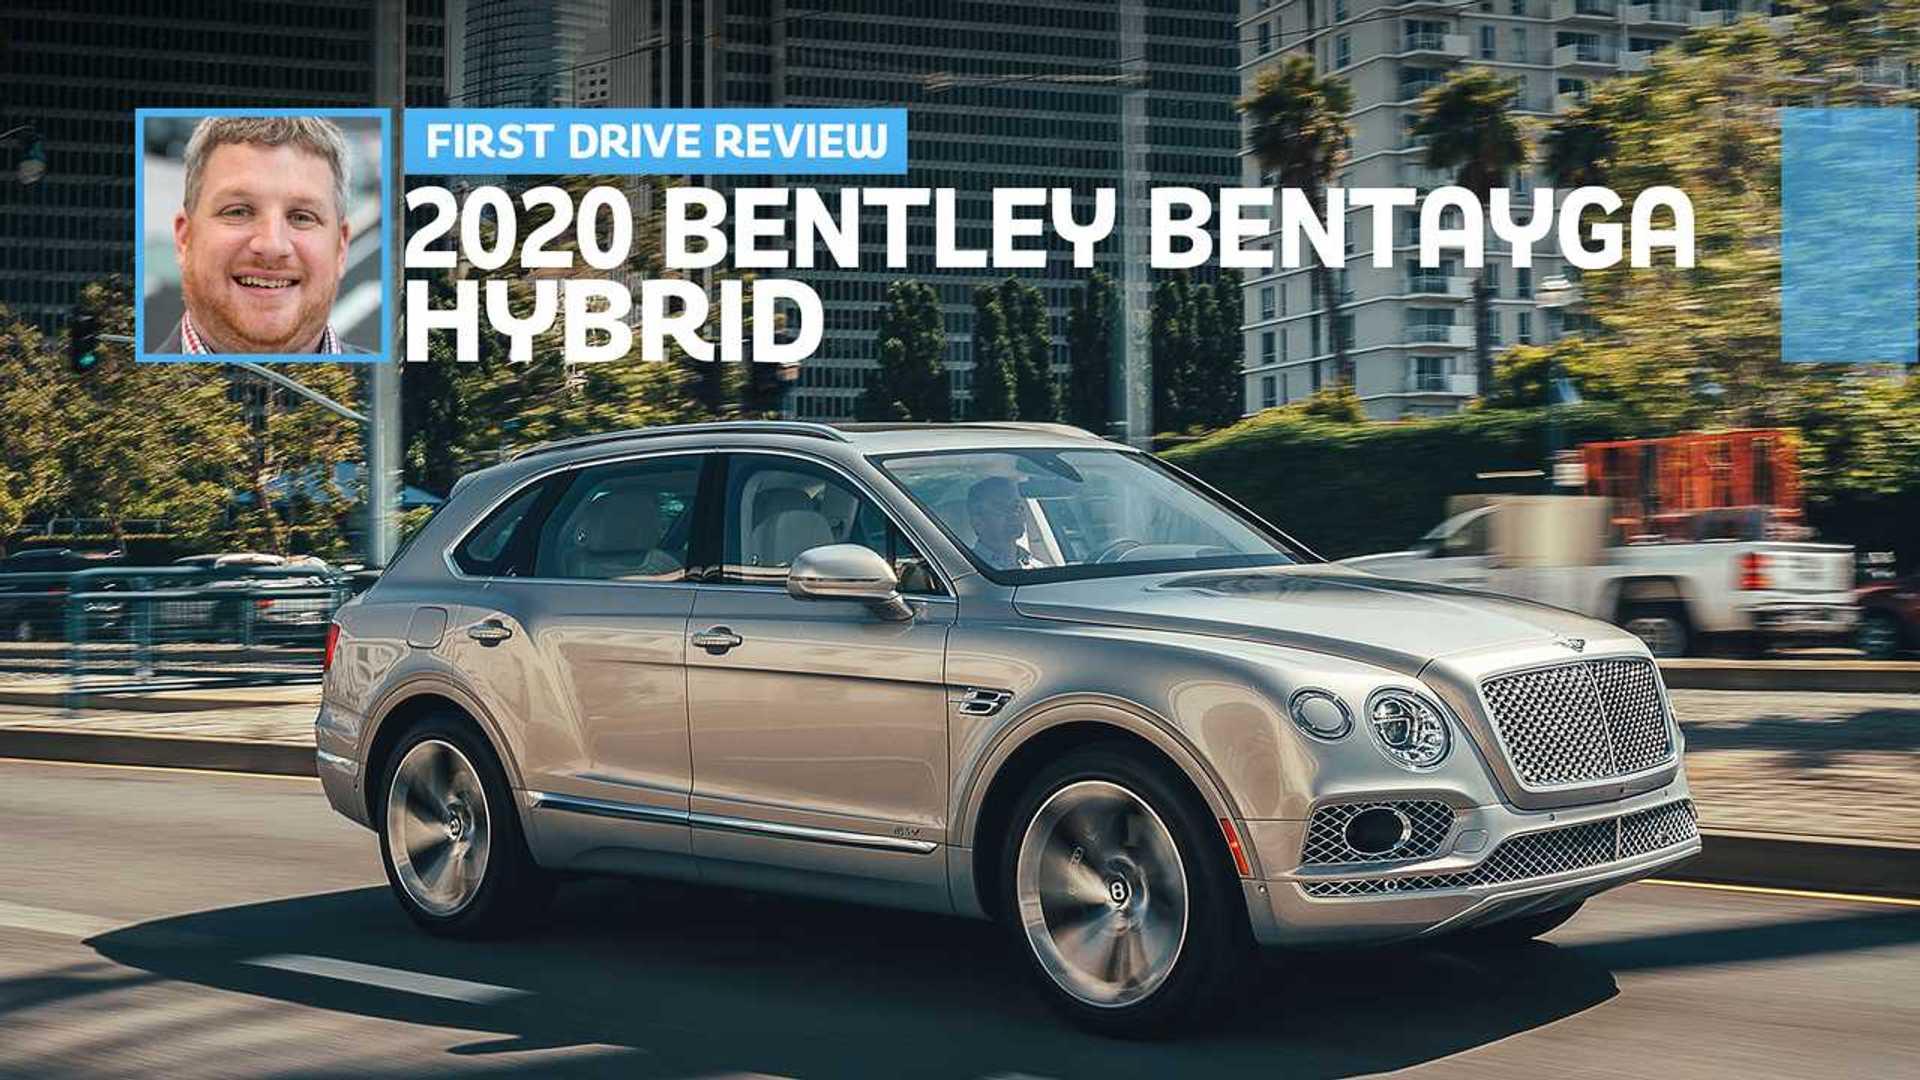 2020 Bentley Bentayga More Powerful Than Ever >> 2020 Bentley Bentayga Hybrid First Drive Starting The